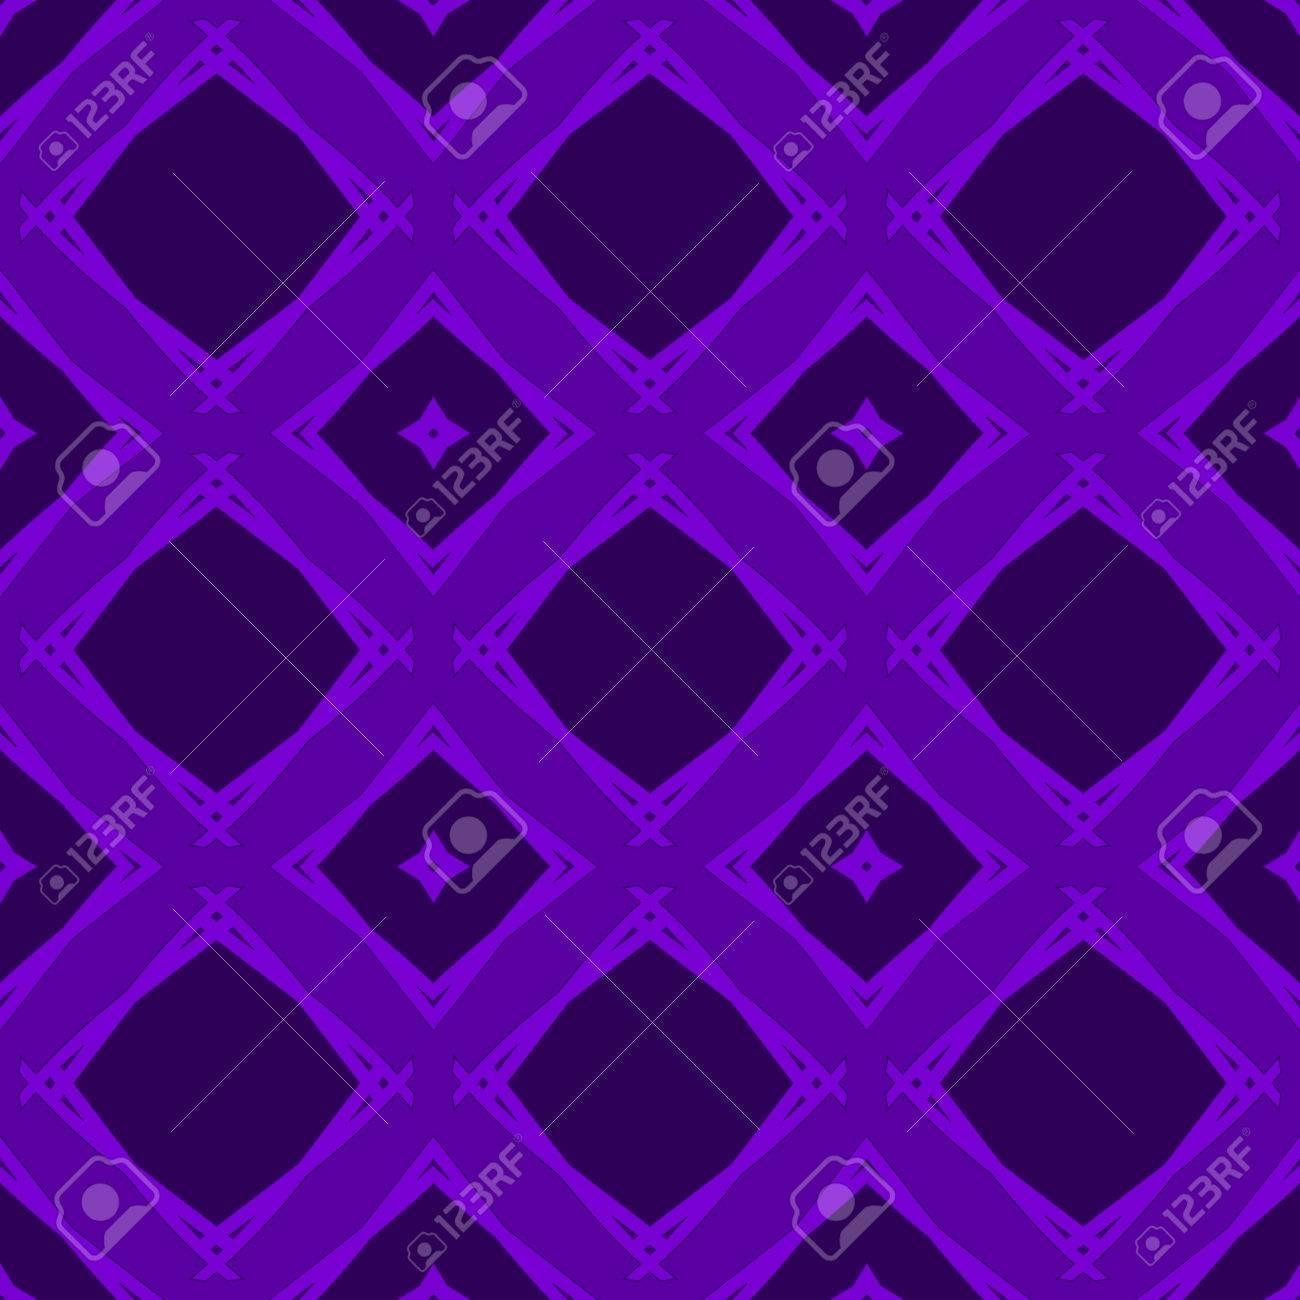 Best Universal Indigo Color Vector Seamless Endlesstexture Can Be Used Universal Indigo Color Vector Seamless Tiling What Color Is Indigo Ink Pearl What Color Is Indigo Batik photos What Color Is Indigo